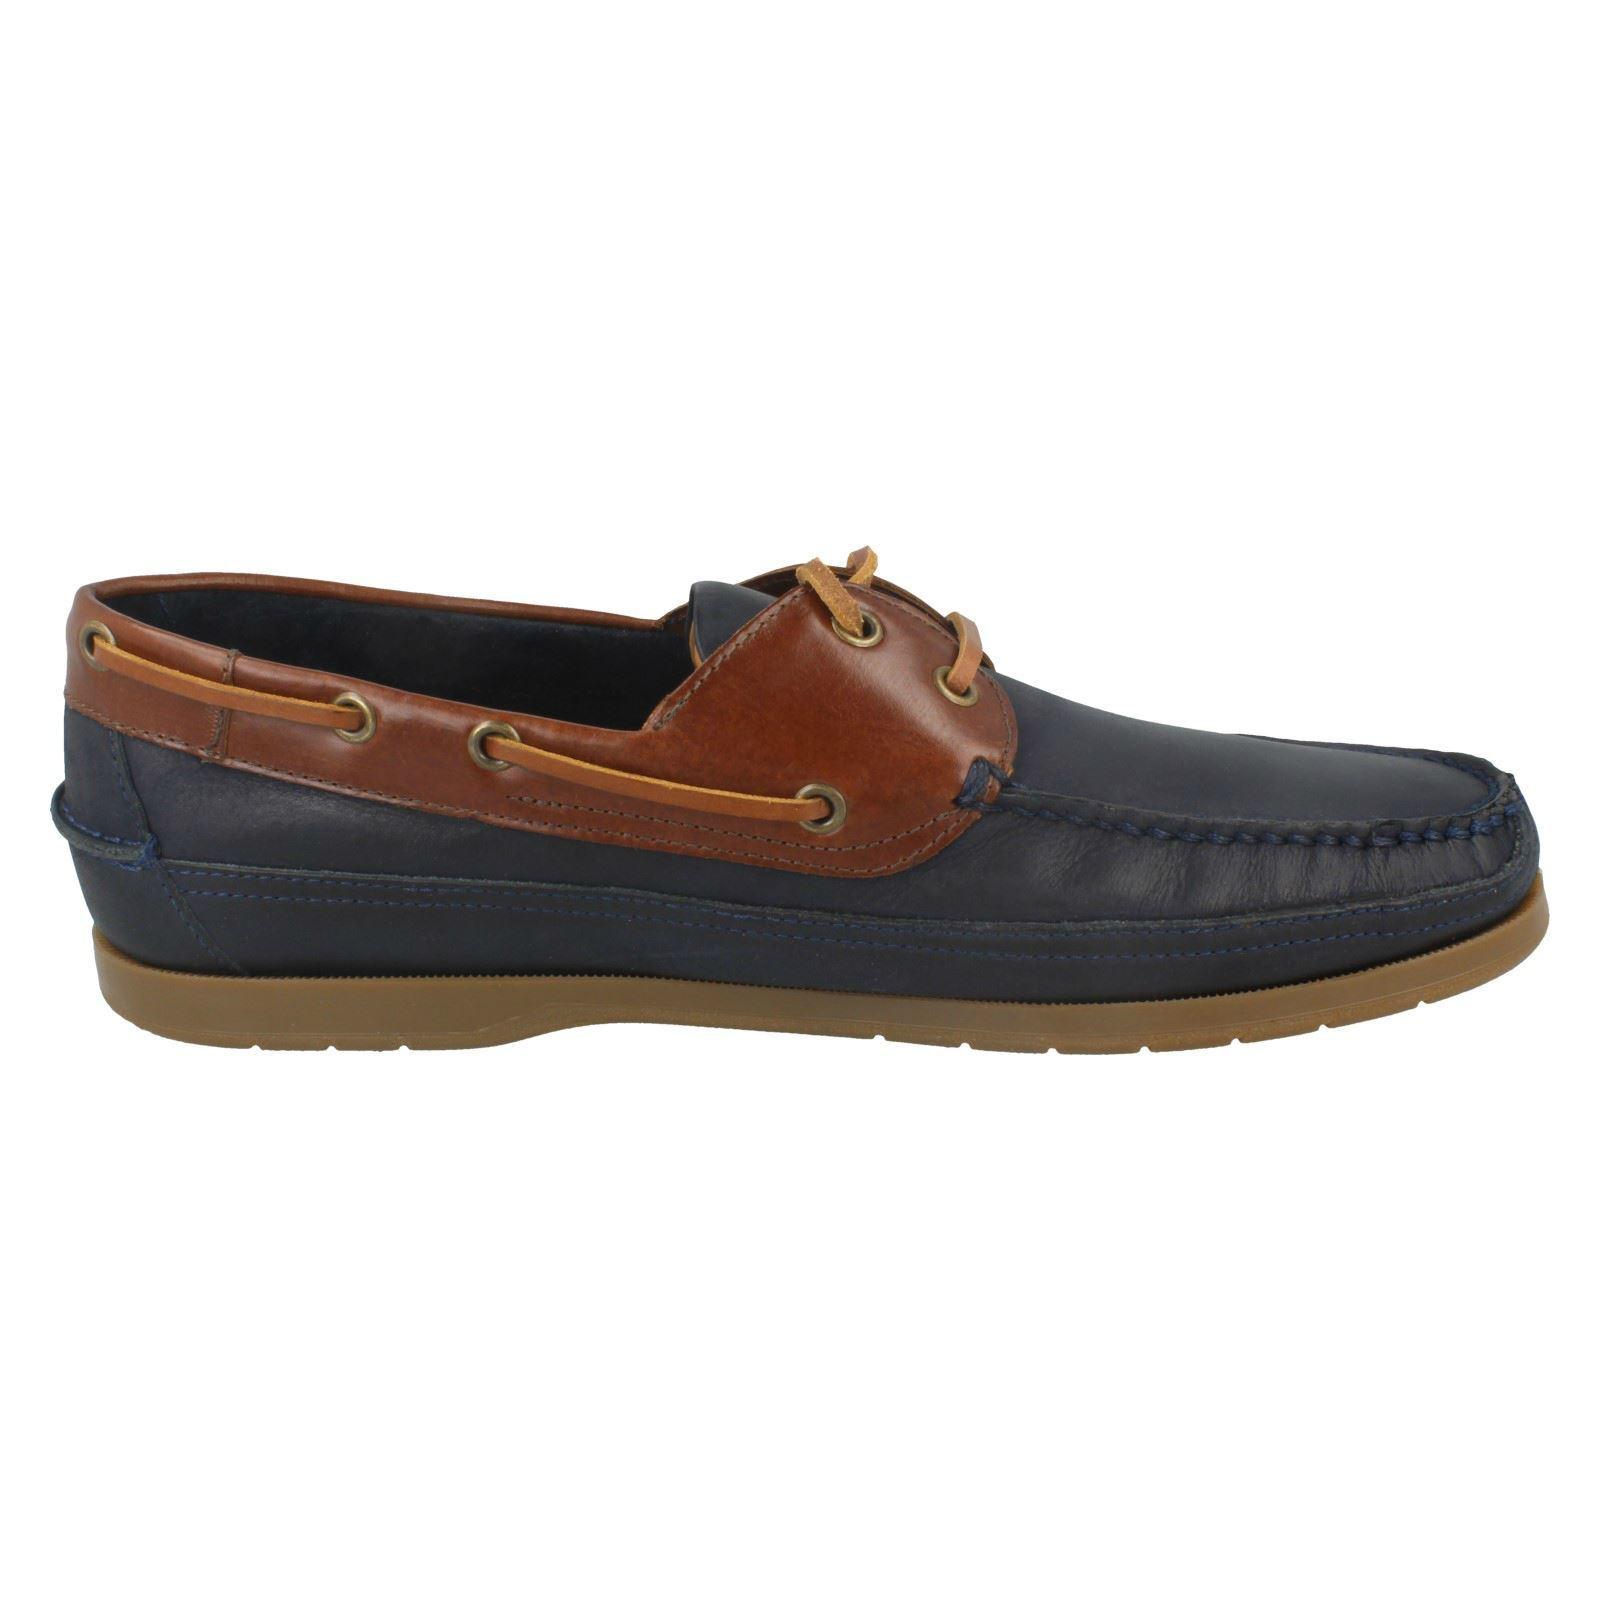 Chaussures - Chaussures À Lacets Havane & Co. GQZk9VGQN